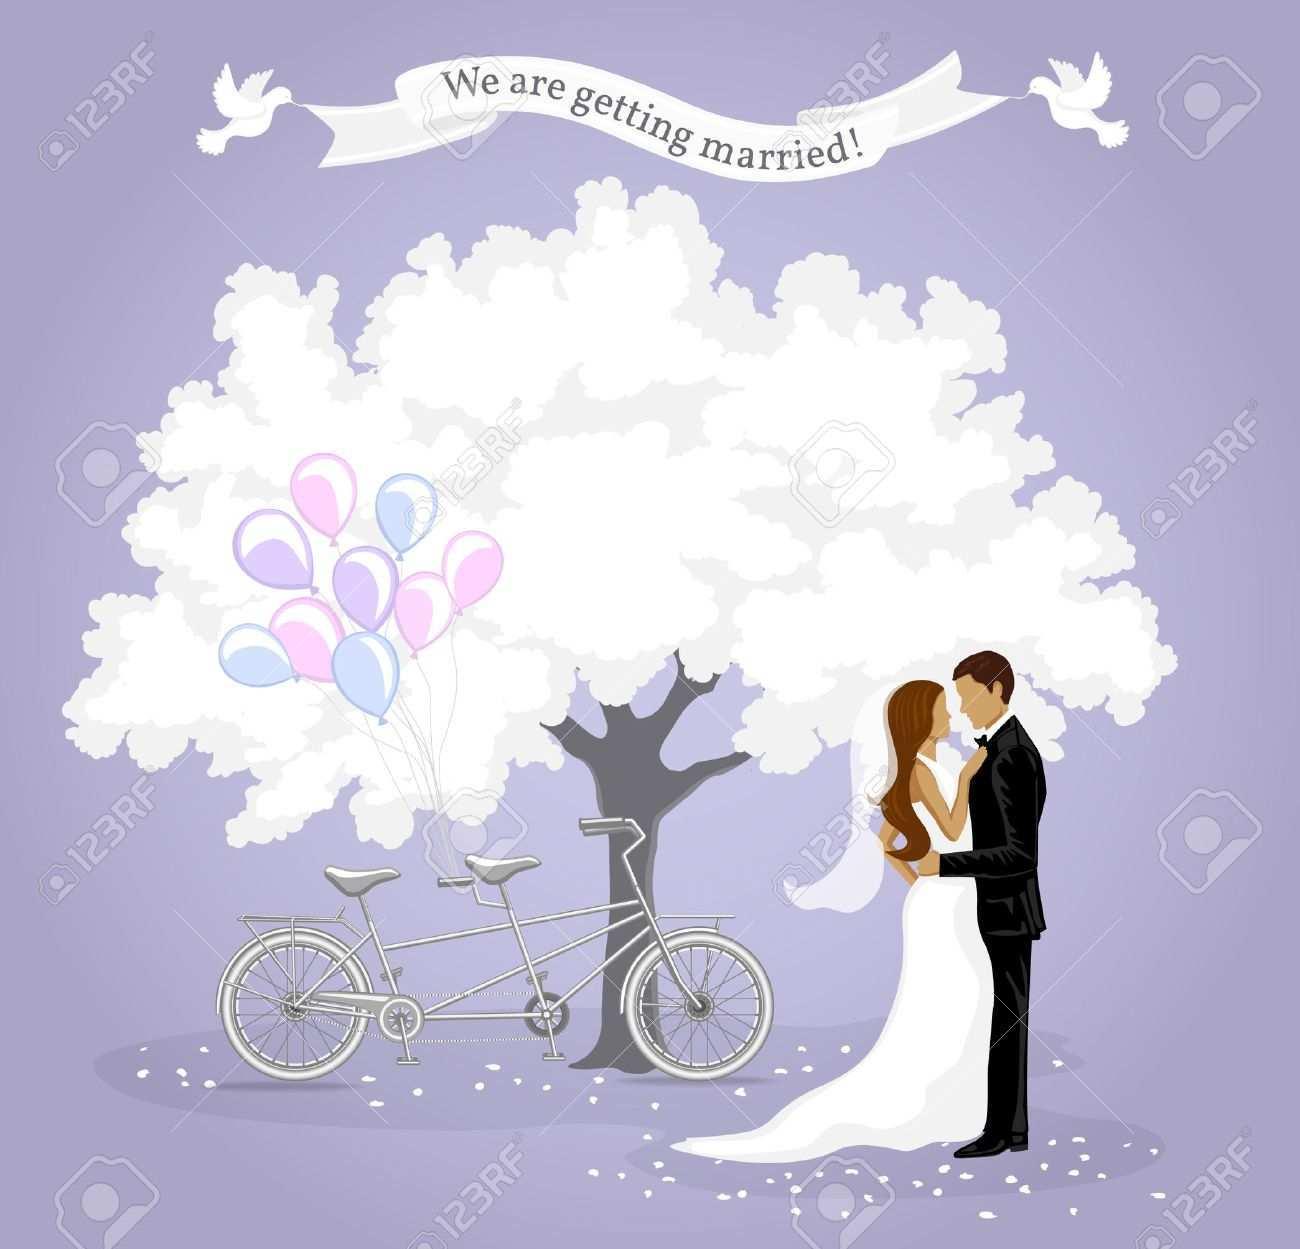 84 Free Printable Wedding Invitation Template Background For Free for Wedding Invitation Template Background